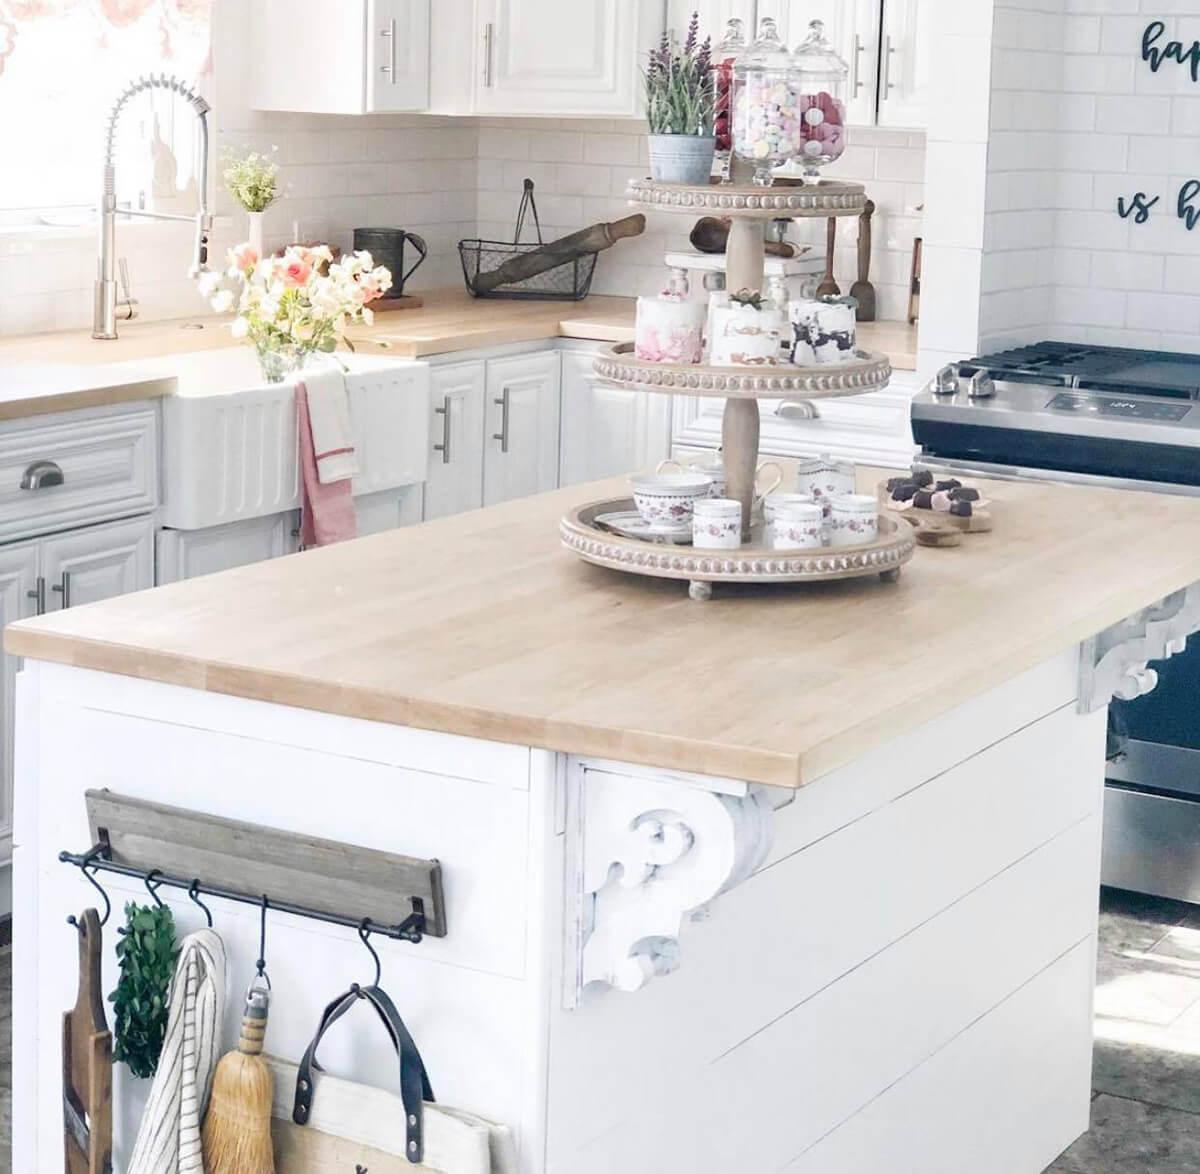 12+ Best Farmhouse Kitchen Decor and Design Ideas for 12